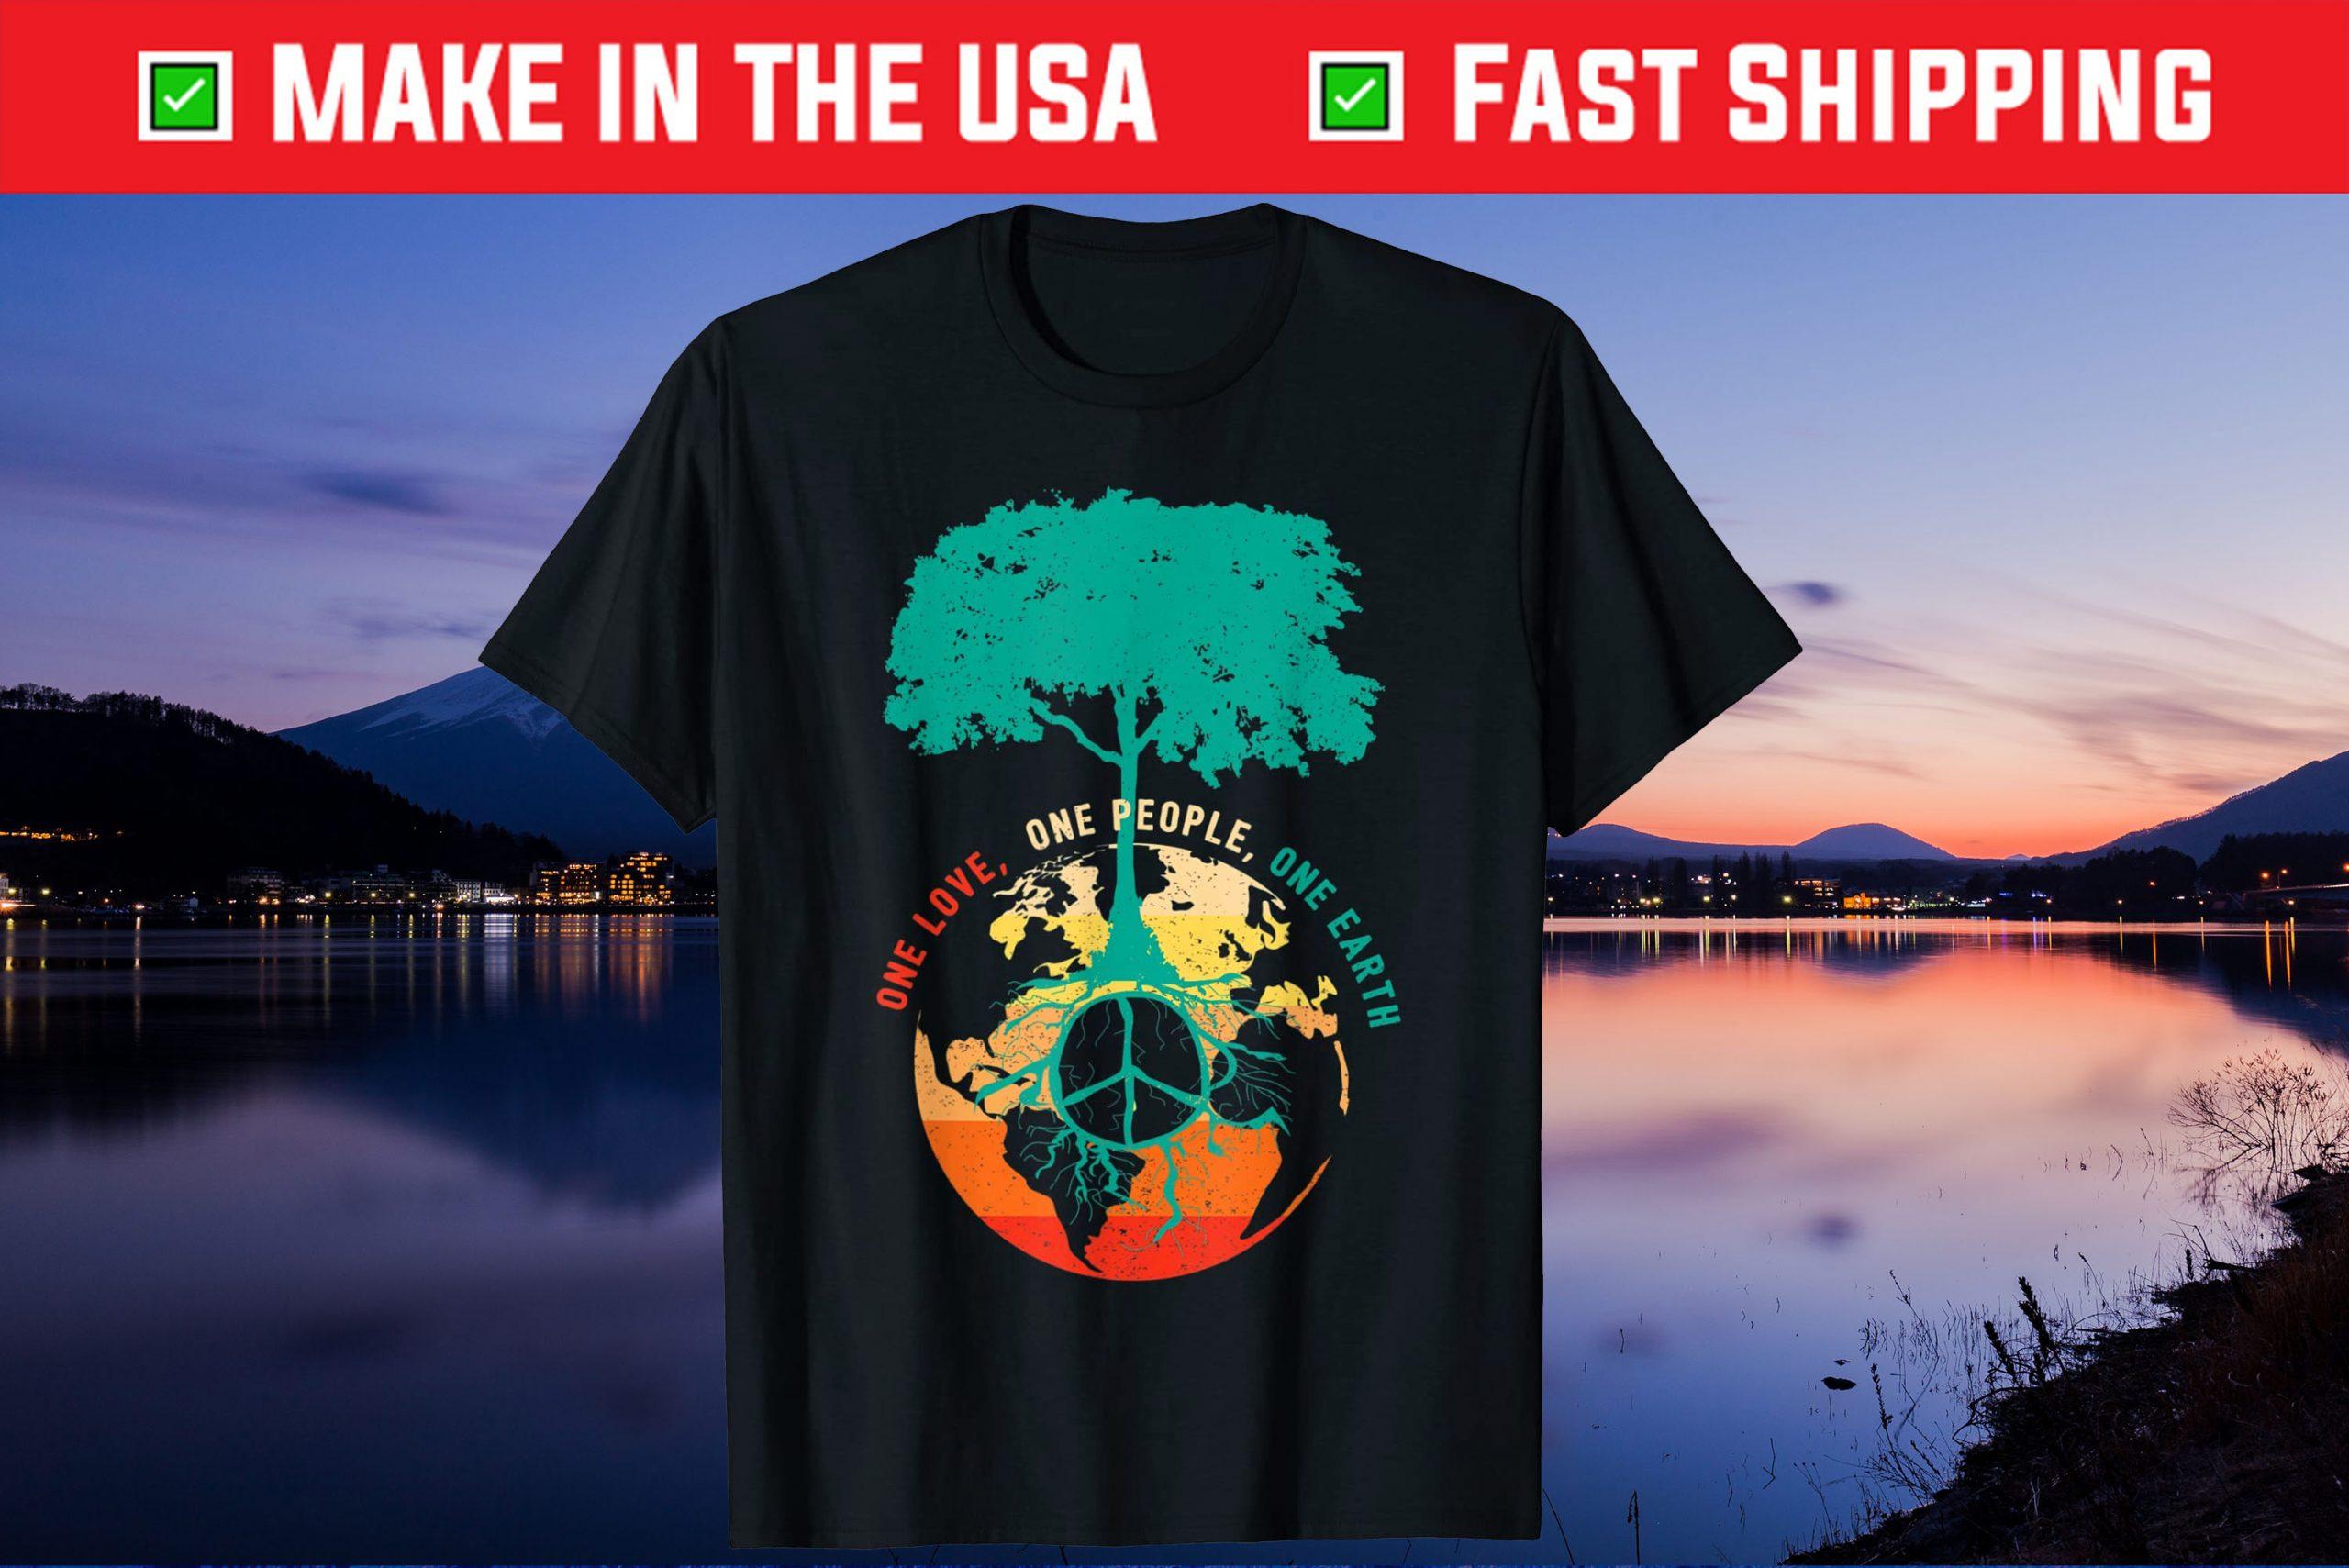 World Peace Tree Love People Earth Day 60s 70s Hippie Retro Us 2021 T-Shirt